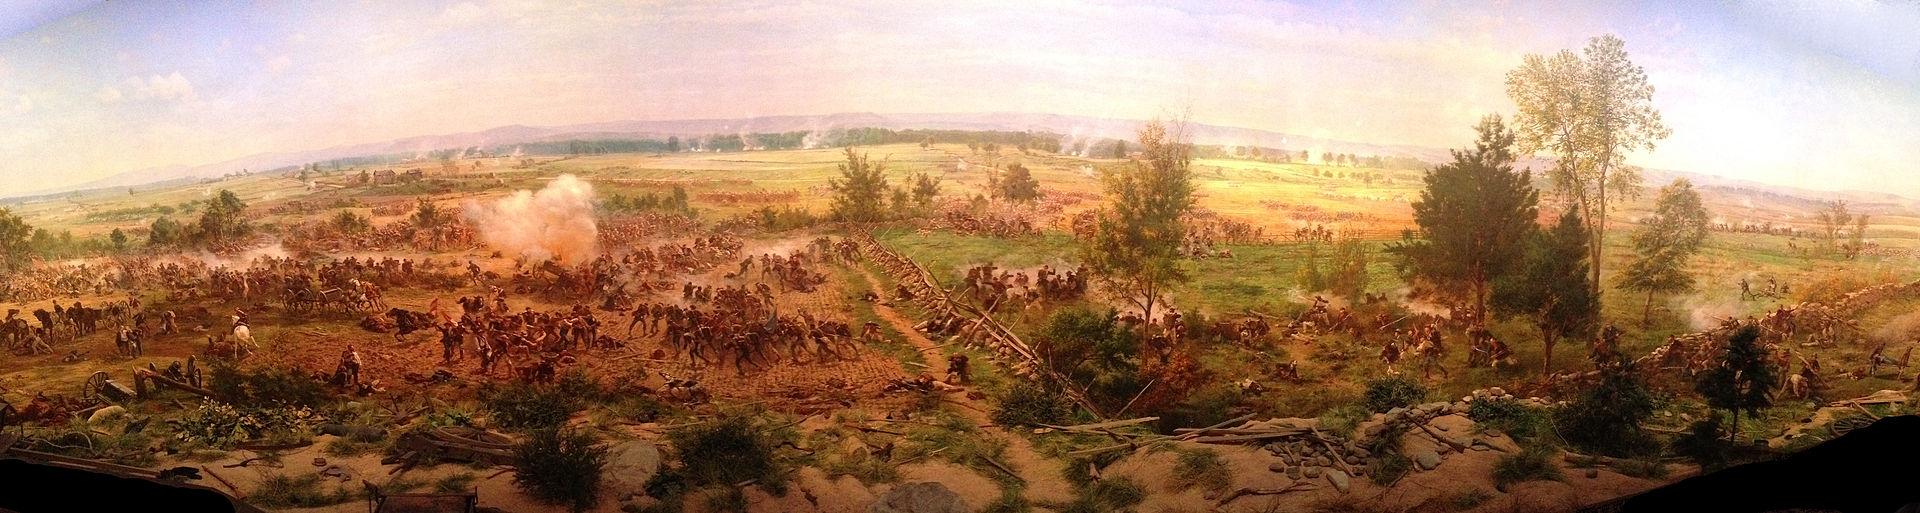 Paul Philippoteaux - Gettysburg Cyclorama.jpg